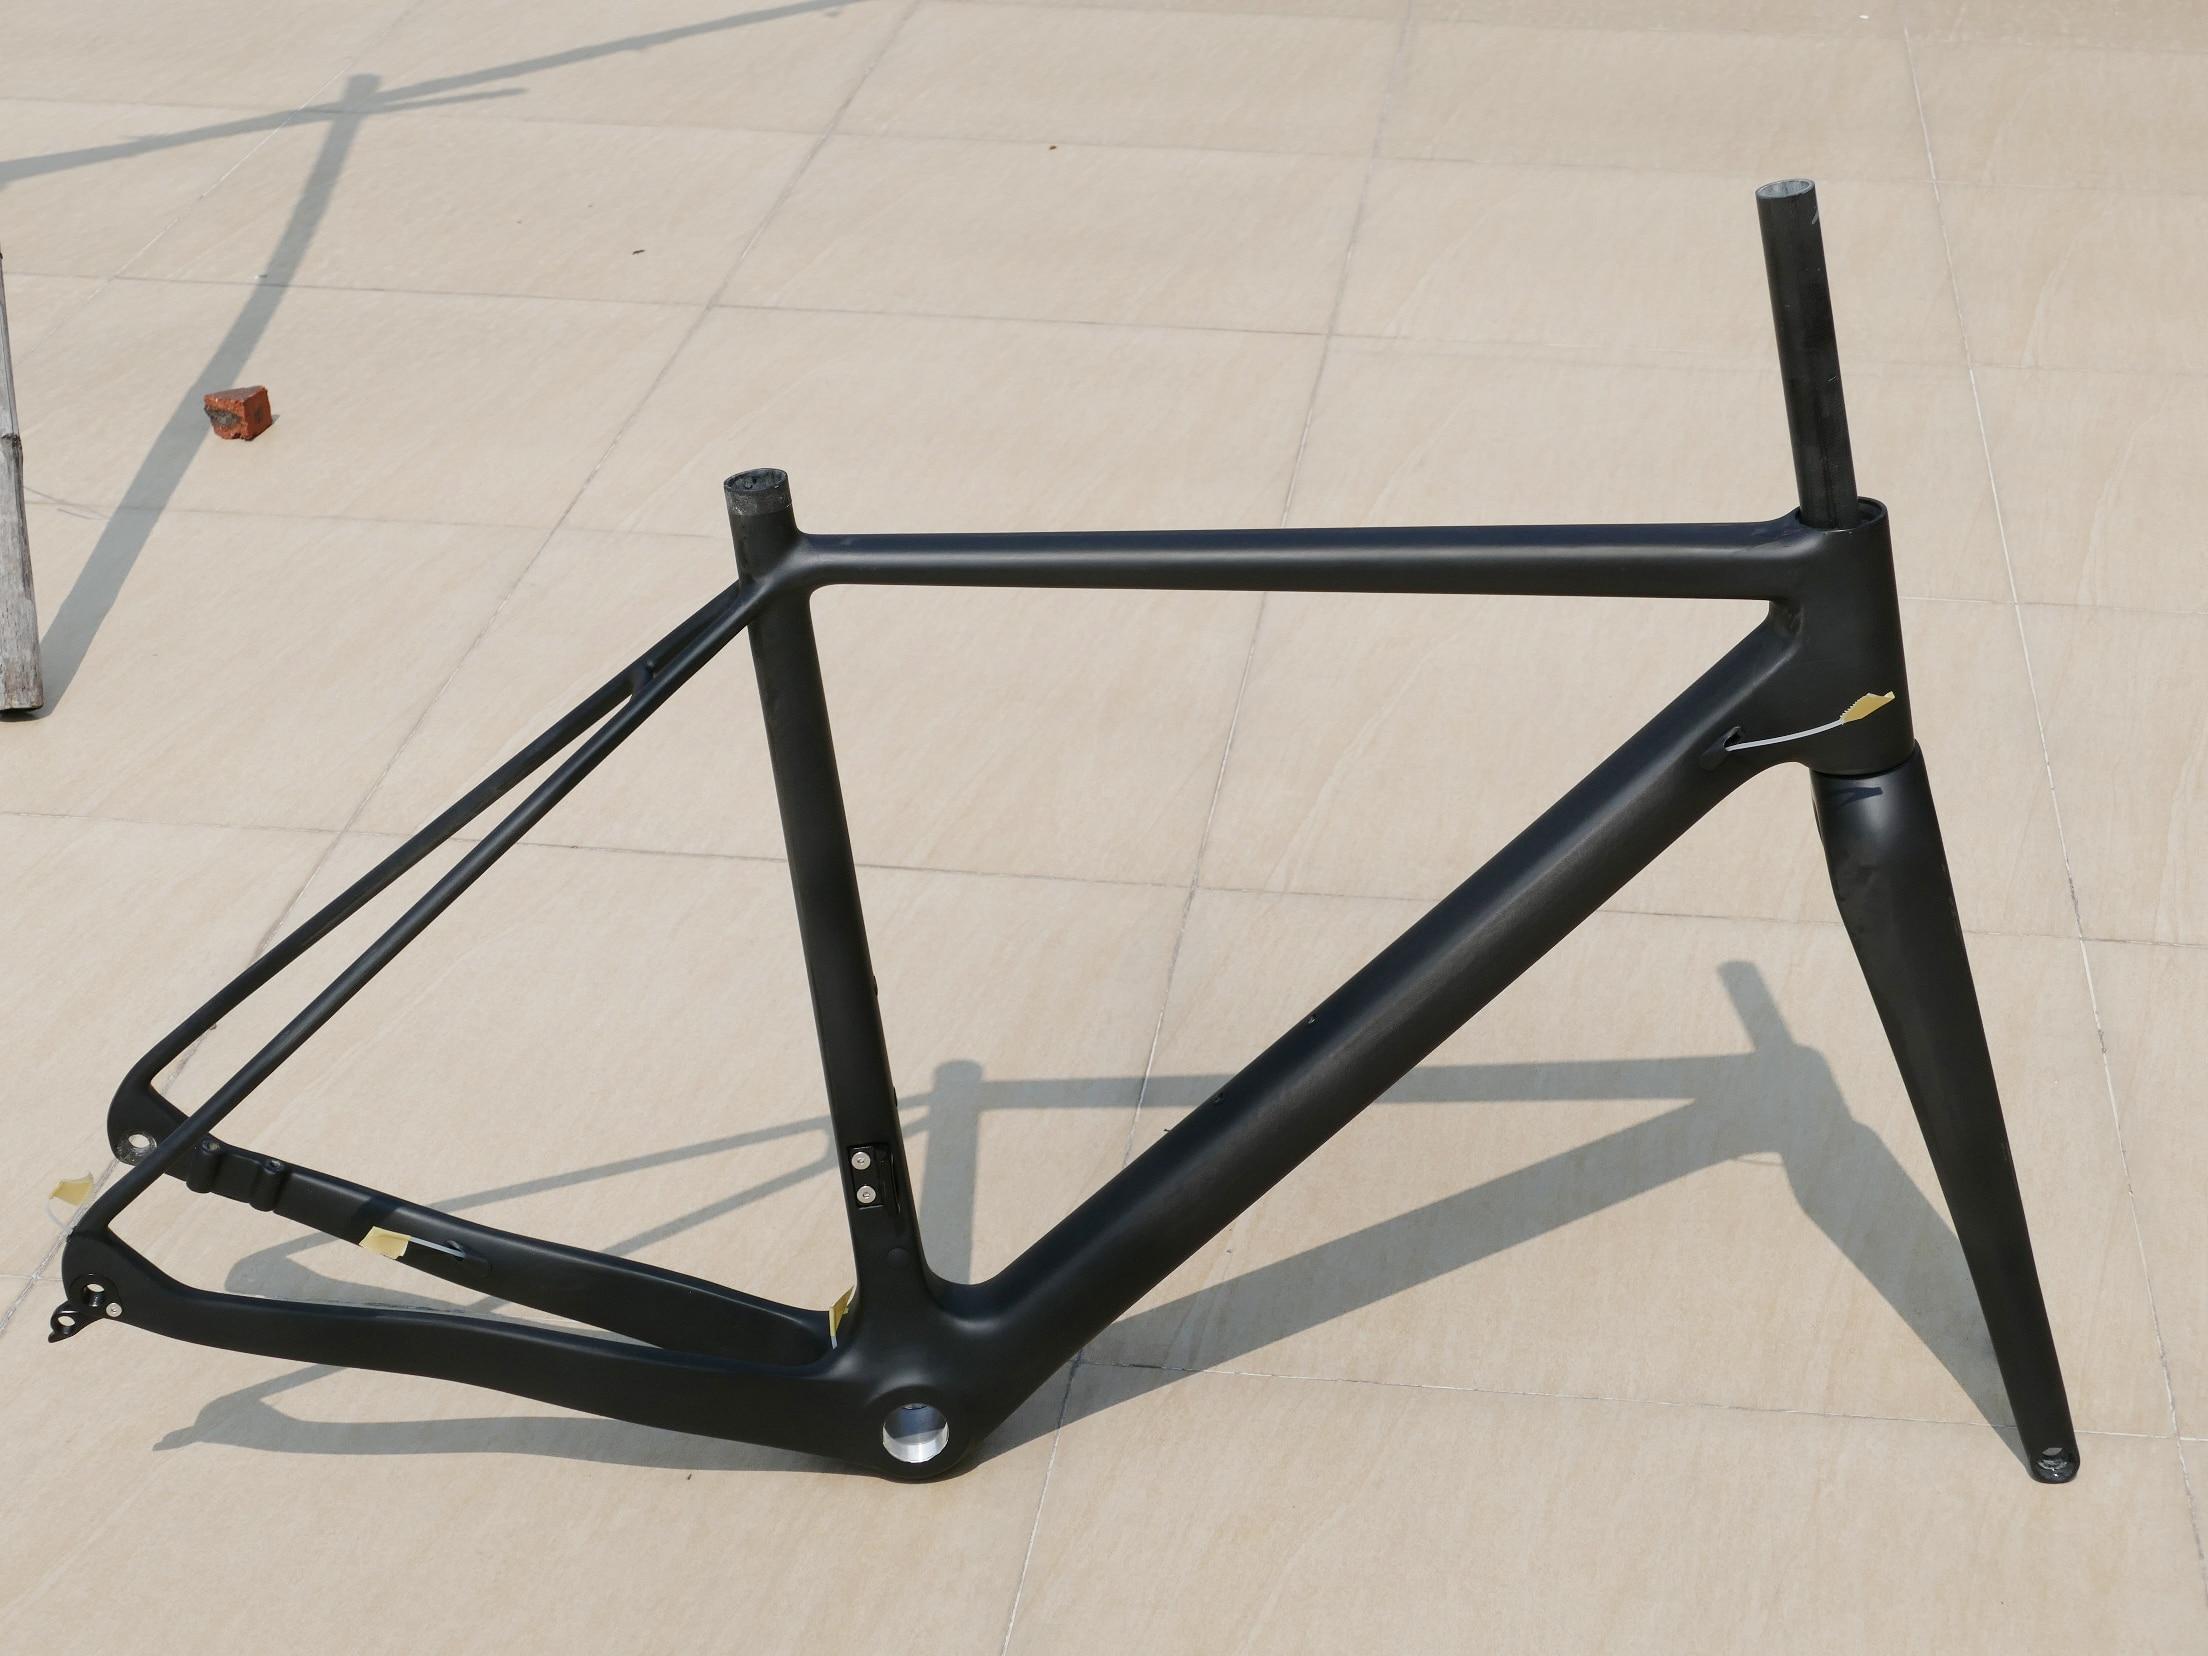 New Carbon Toray Matt Cyclocross Bike Disc Brake BSA BB30 Bicycle Frame 12 * 142mm Thru Axle  +  Fork 15 * 100mm Thru Axle